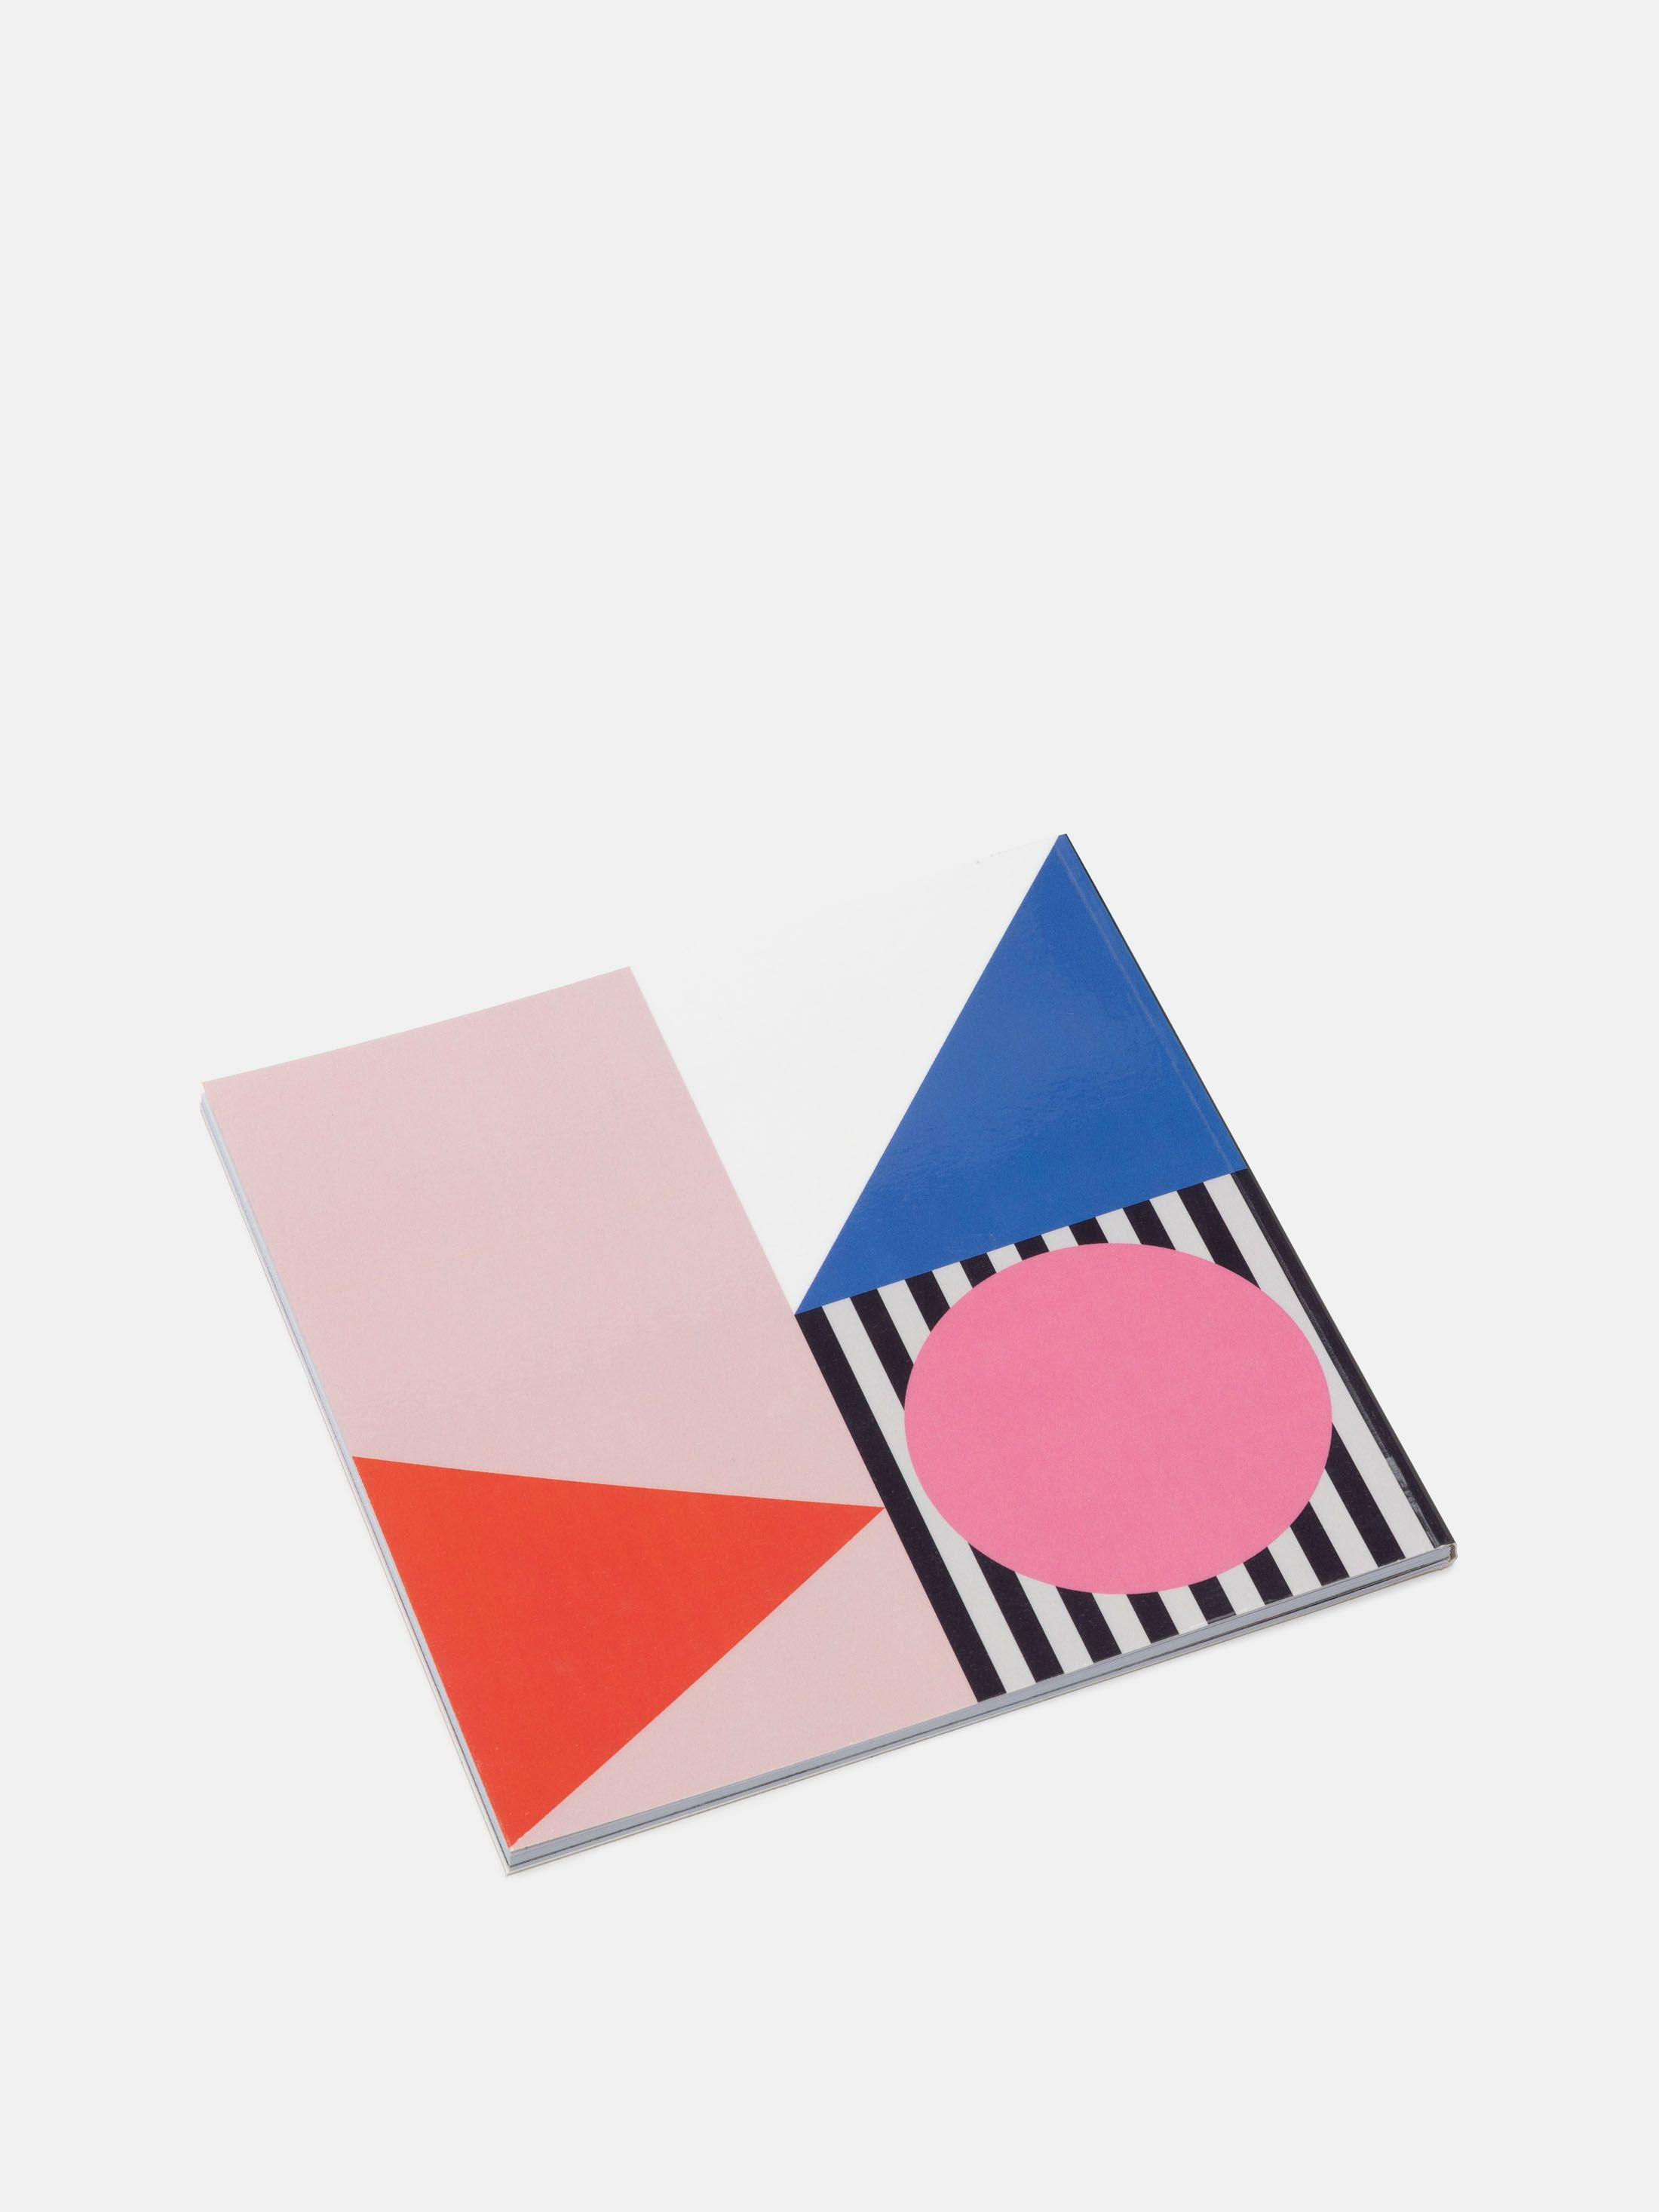 Square Photo Book Printing for Portfolio